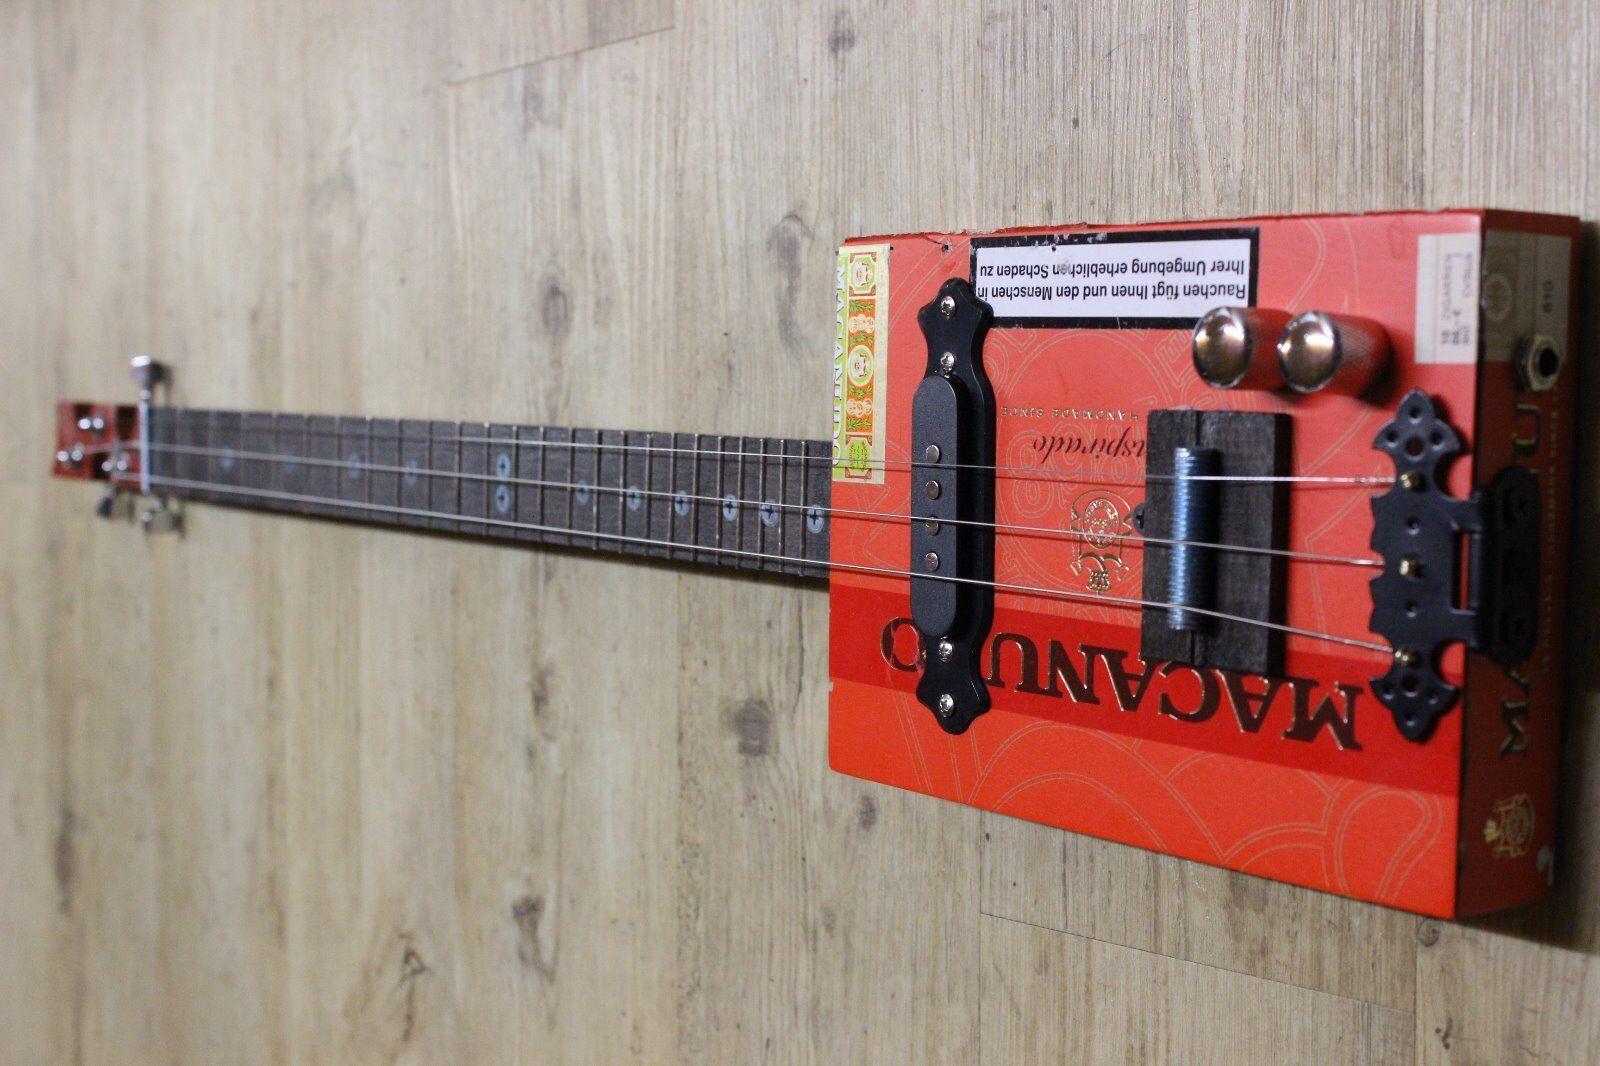 Zigarren Box Gitarre EDEL-Bausatz 3saitig elektrisch/akustisch ohne Gitarrenhals